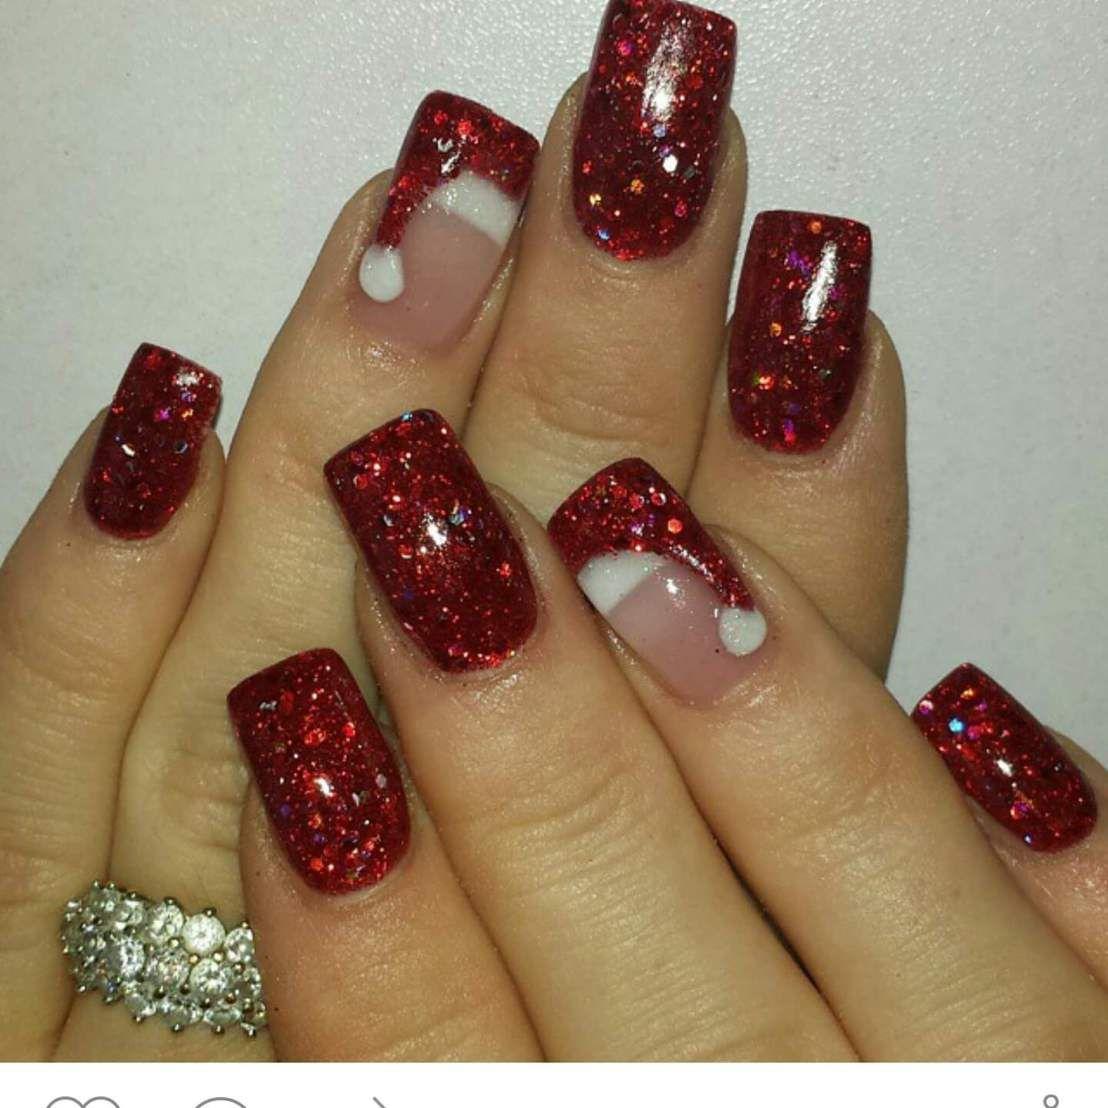 FB_IMG_1449286114207.jpg | LT | Pinterest | Baby nail art, Baby ...